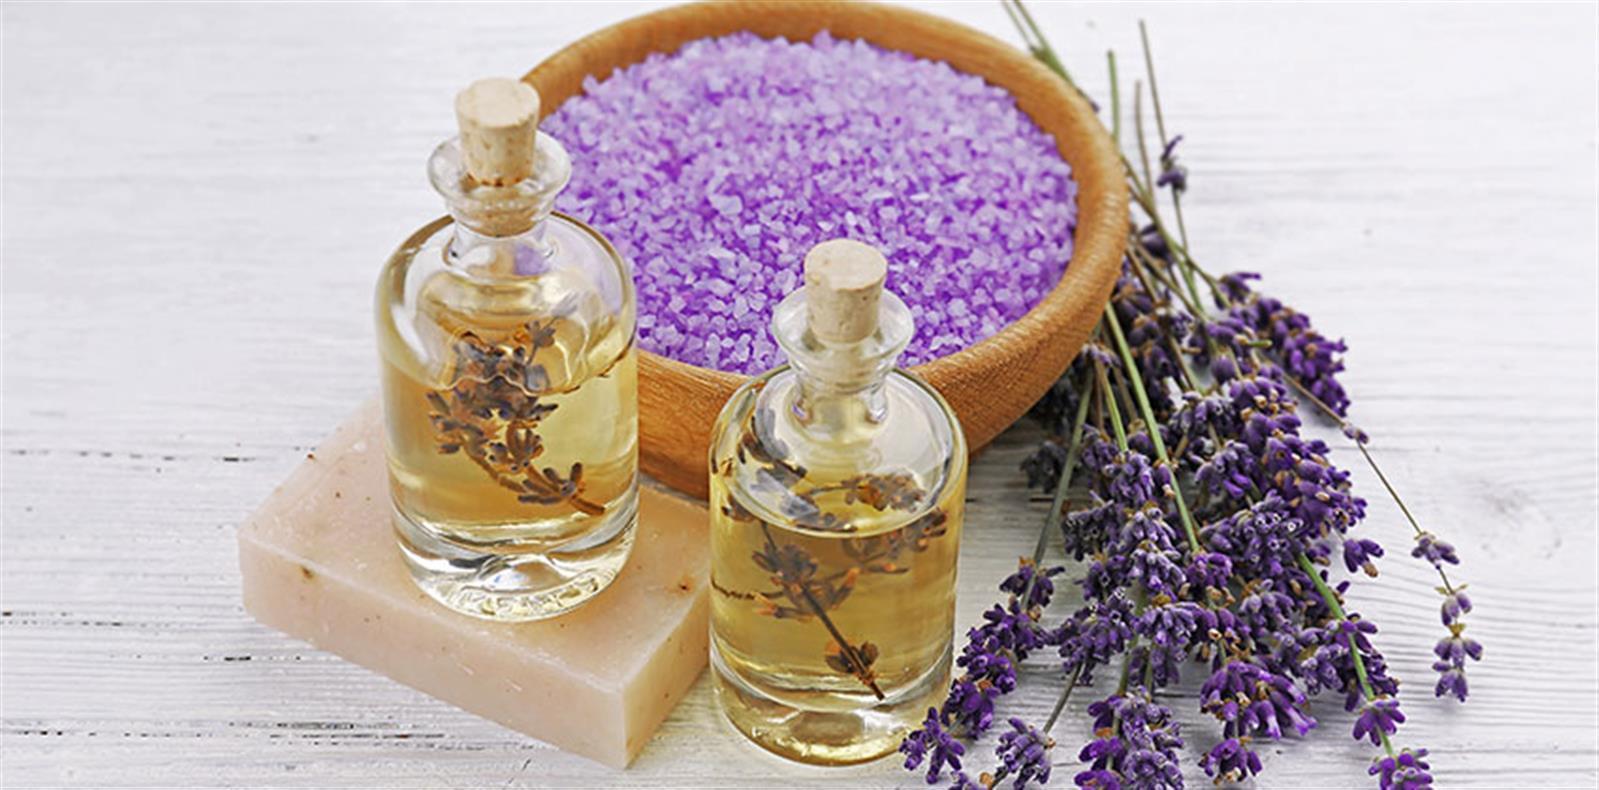 Olio-essenziale-di-lavanda-virtù-e-pregi-principale